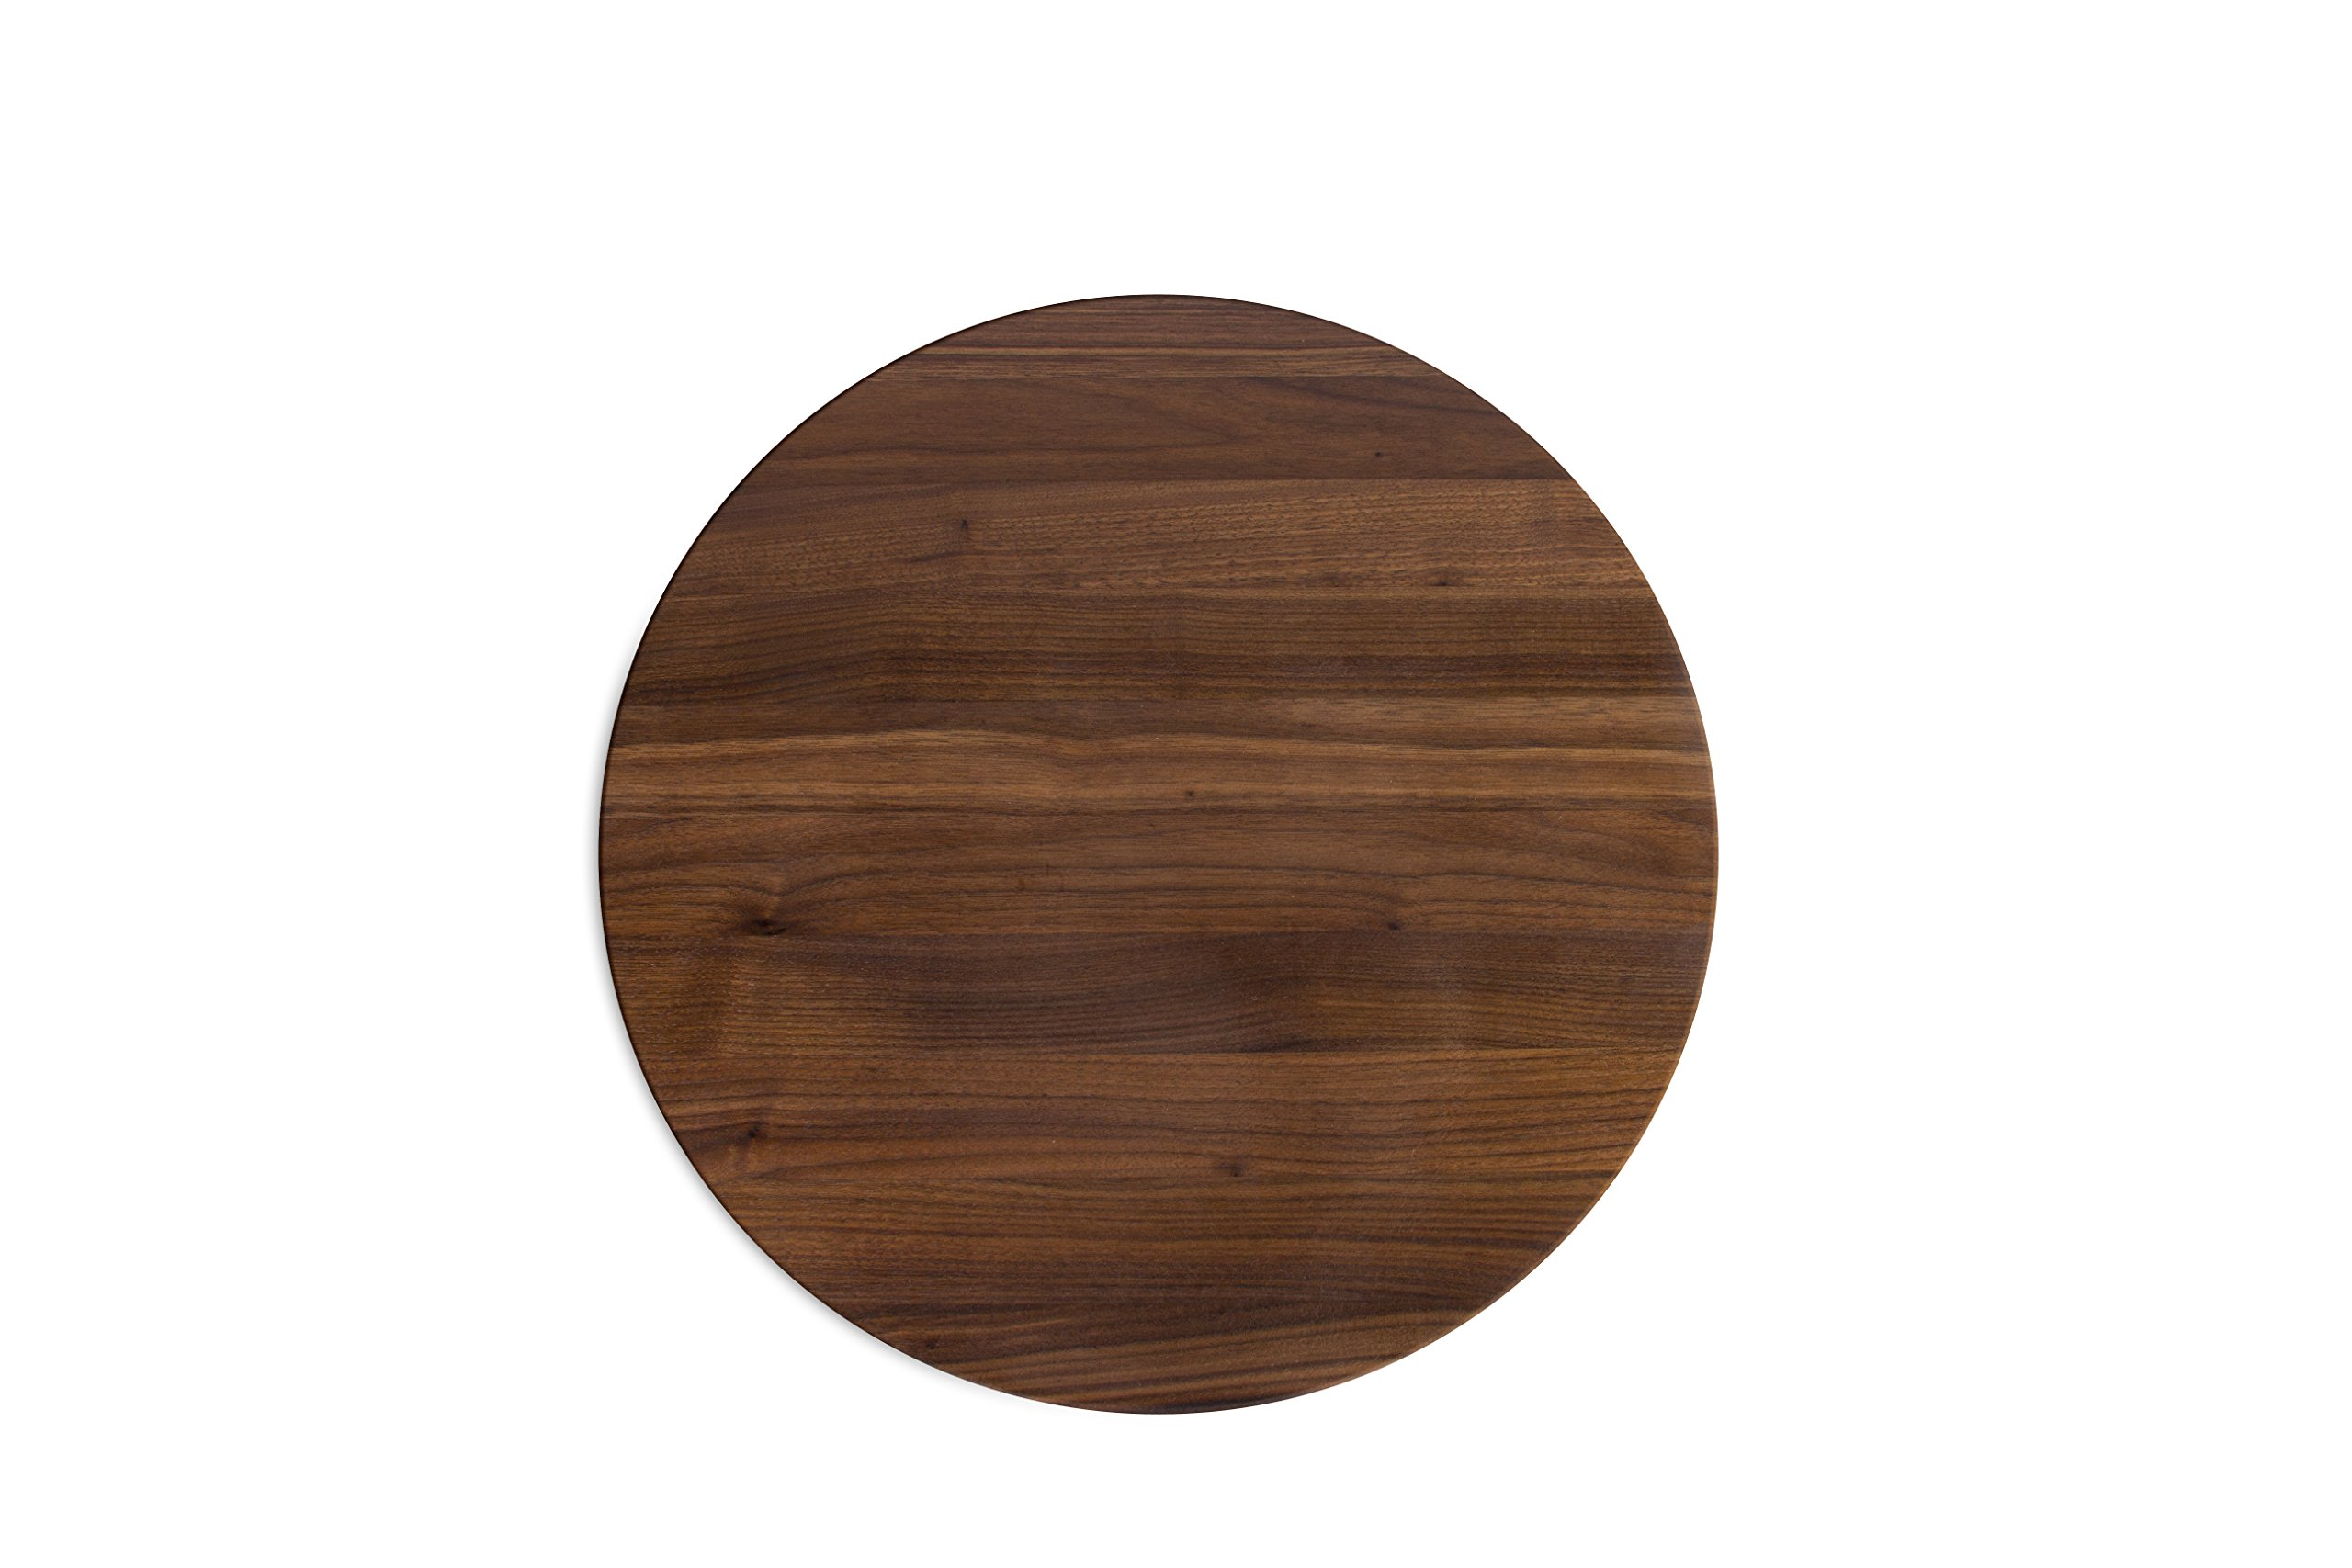 John Boos Block WAL-R18 Walnut Wood Edge Grain Reversible Round Cutting Board, 18 Inches Round x 1.5 Inches by John Boos (Image #1)